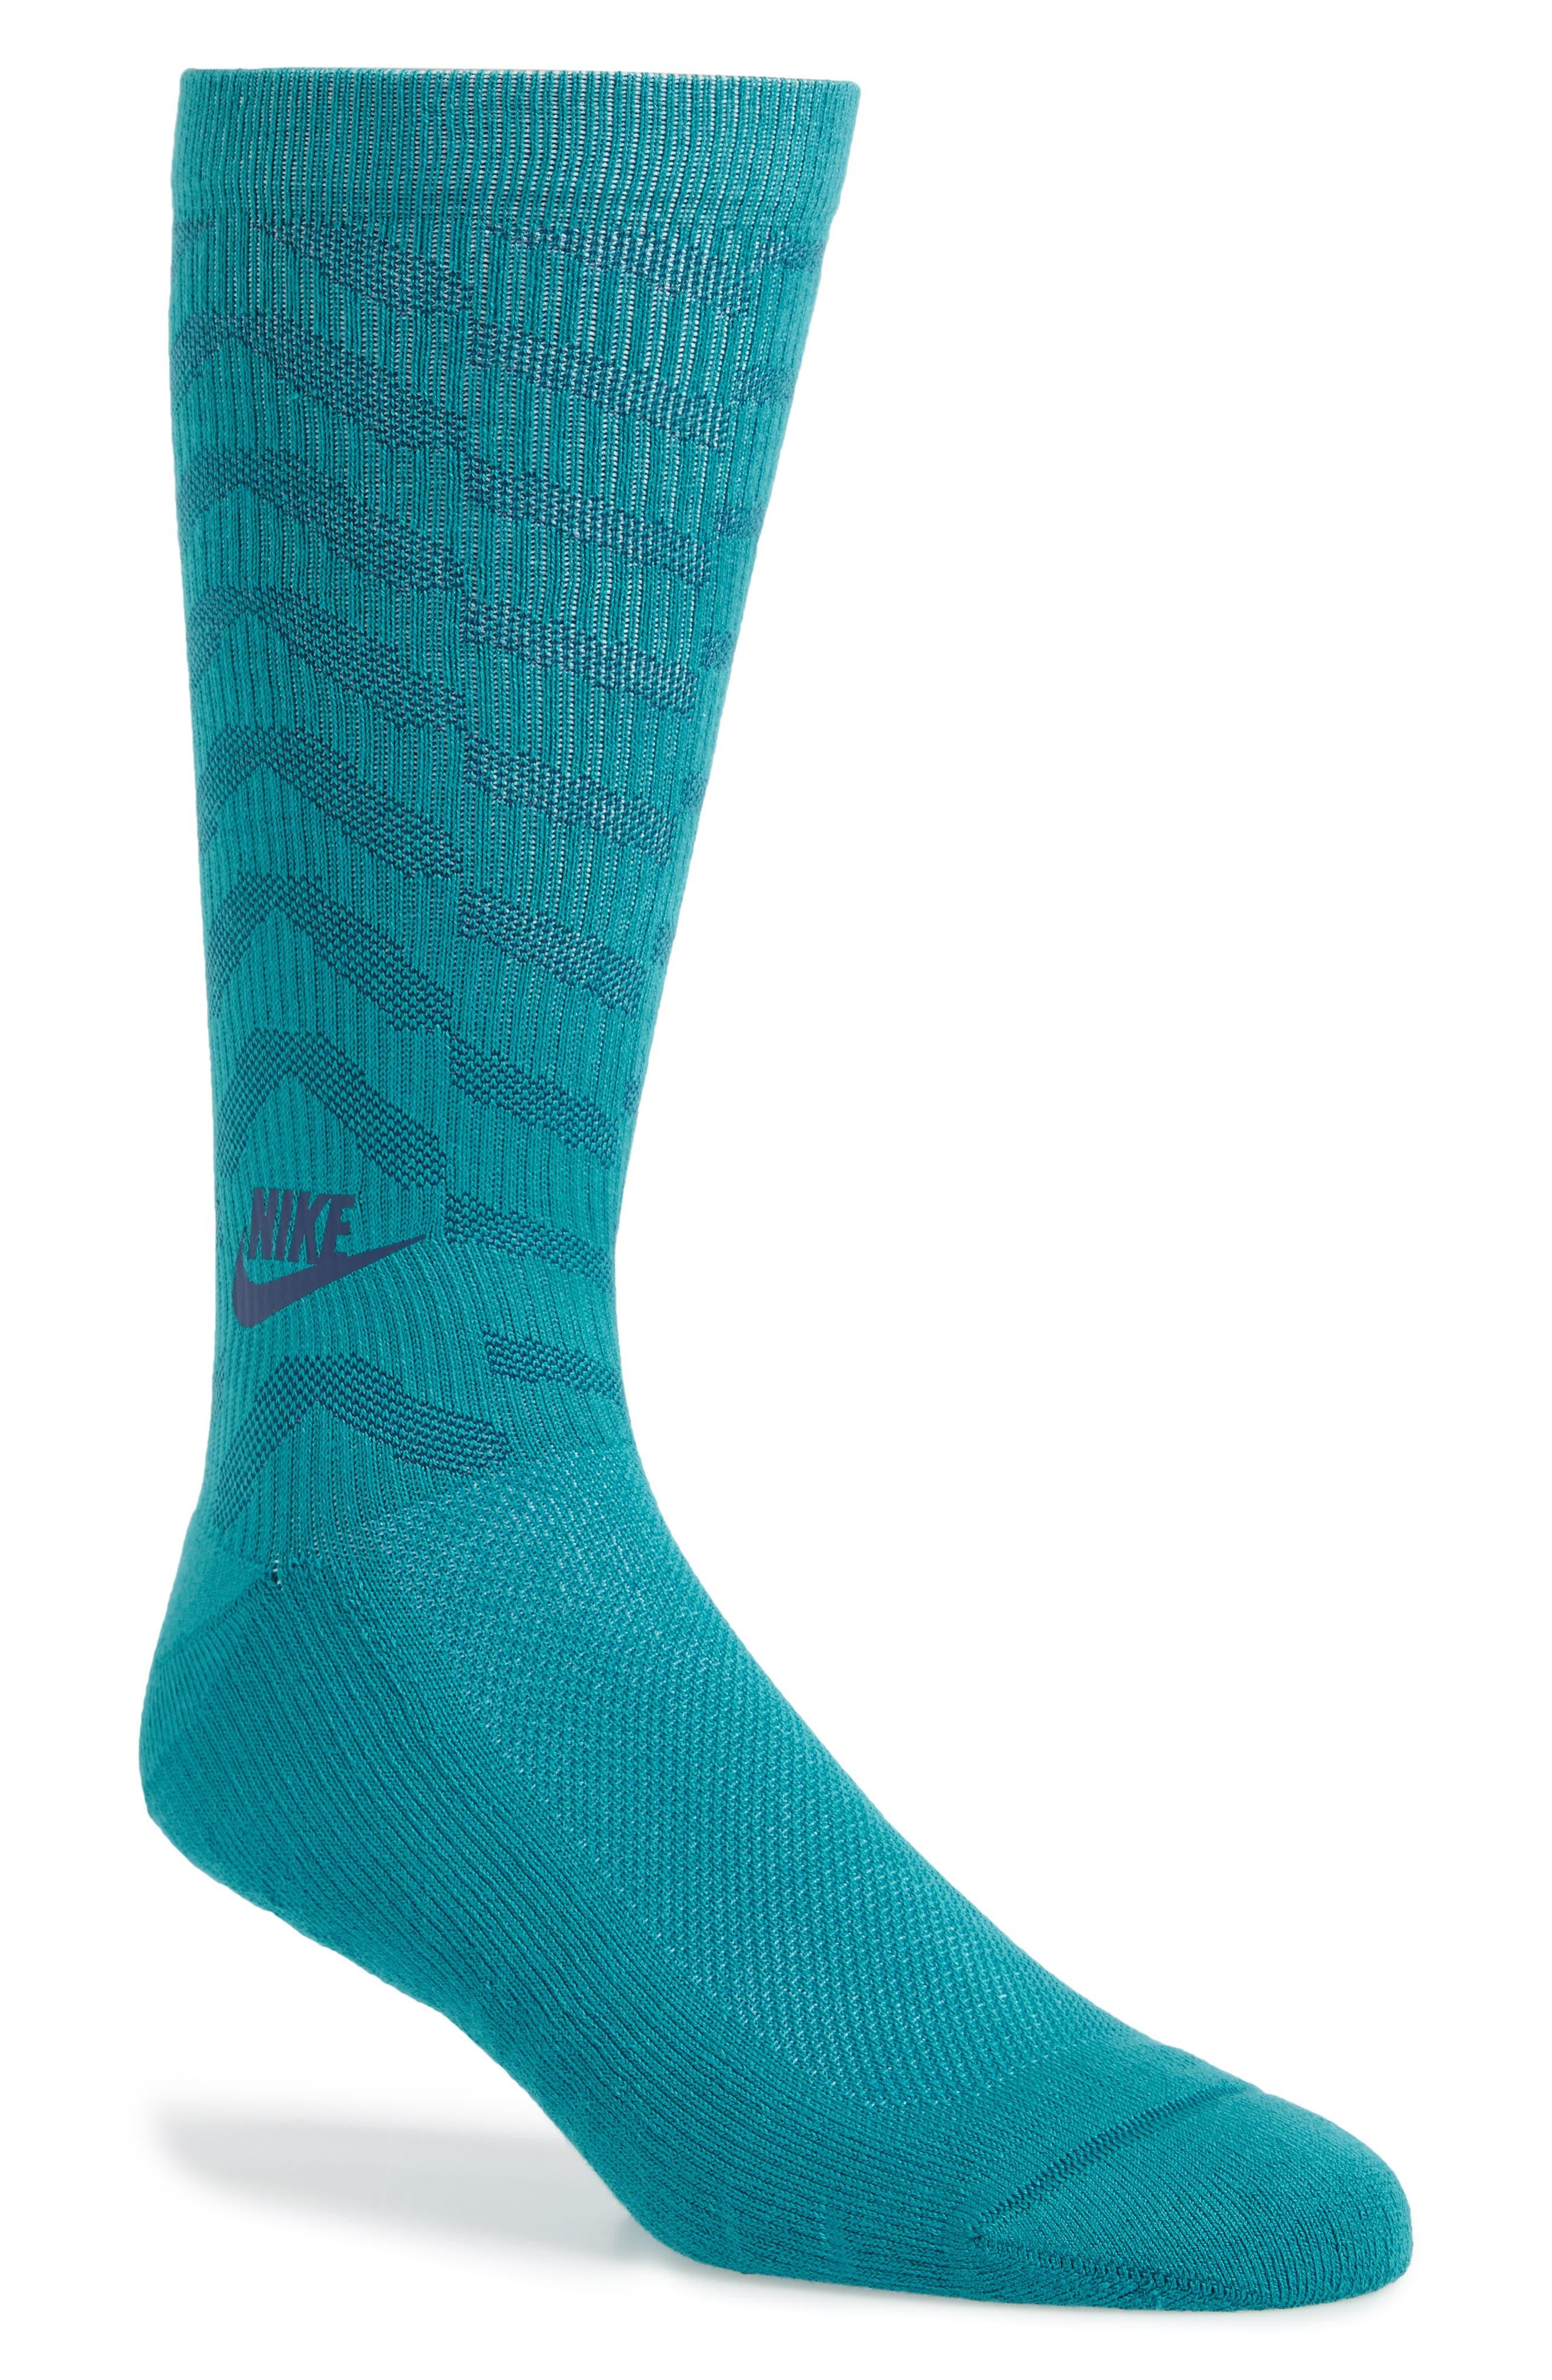 Nike Statement Graphic Socks